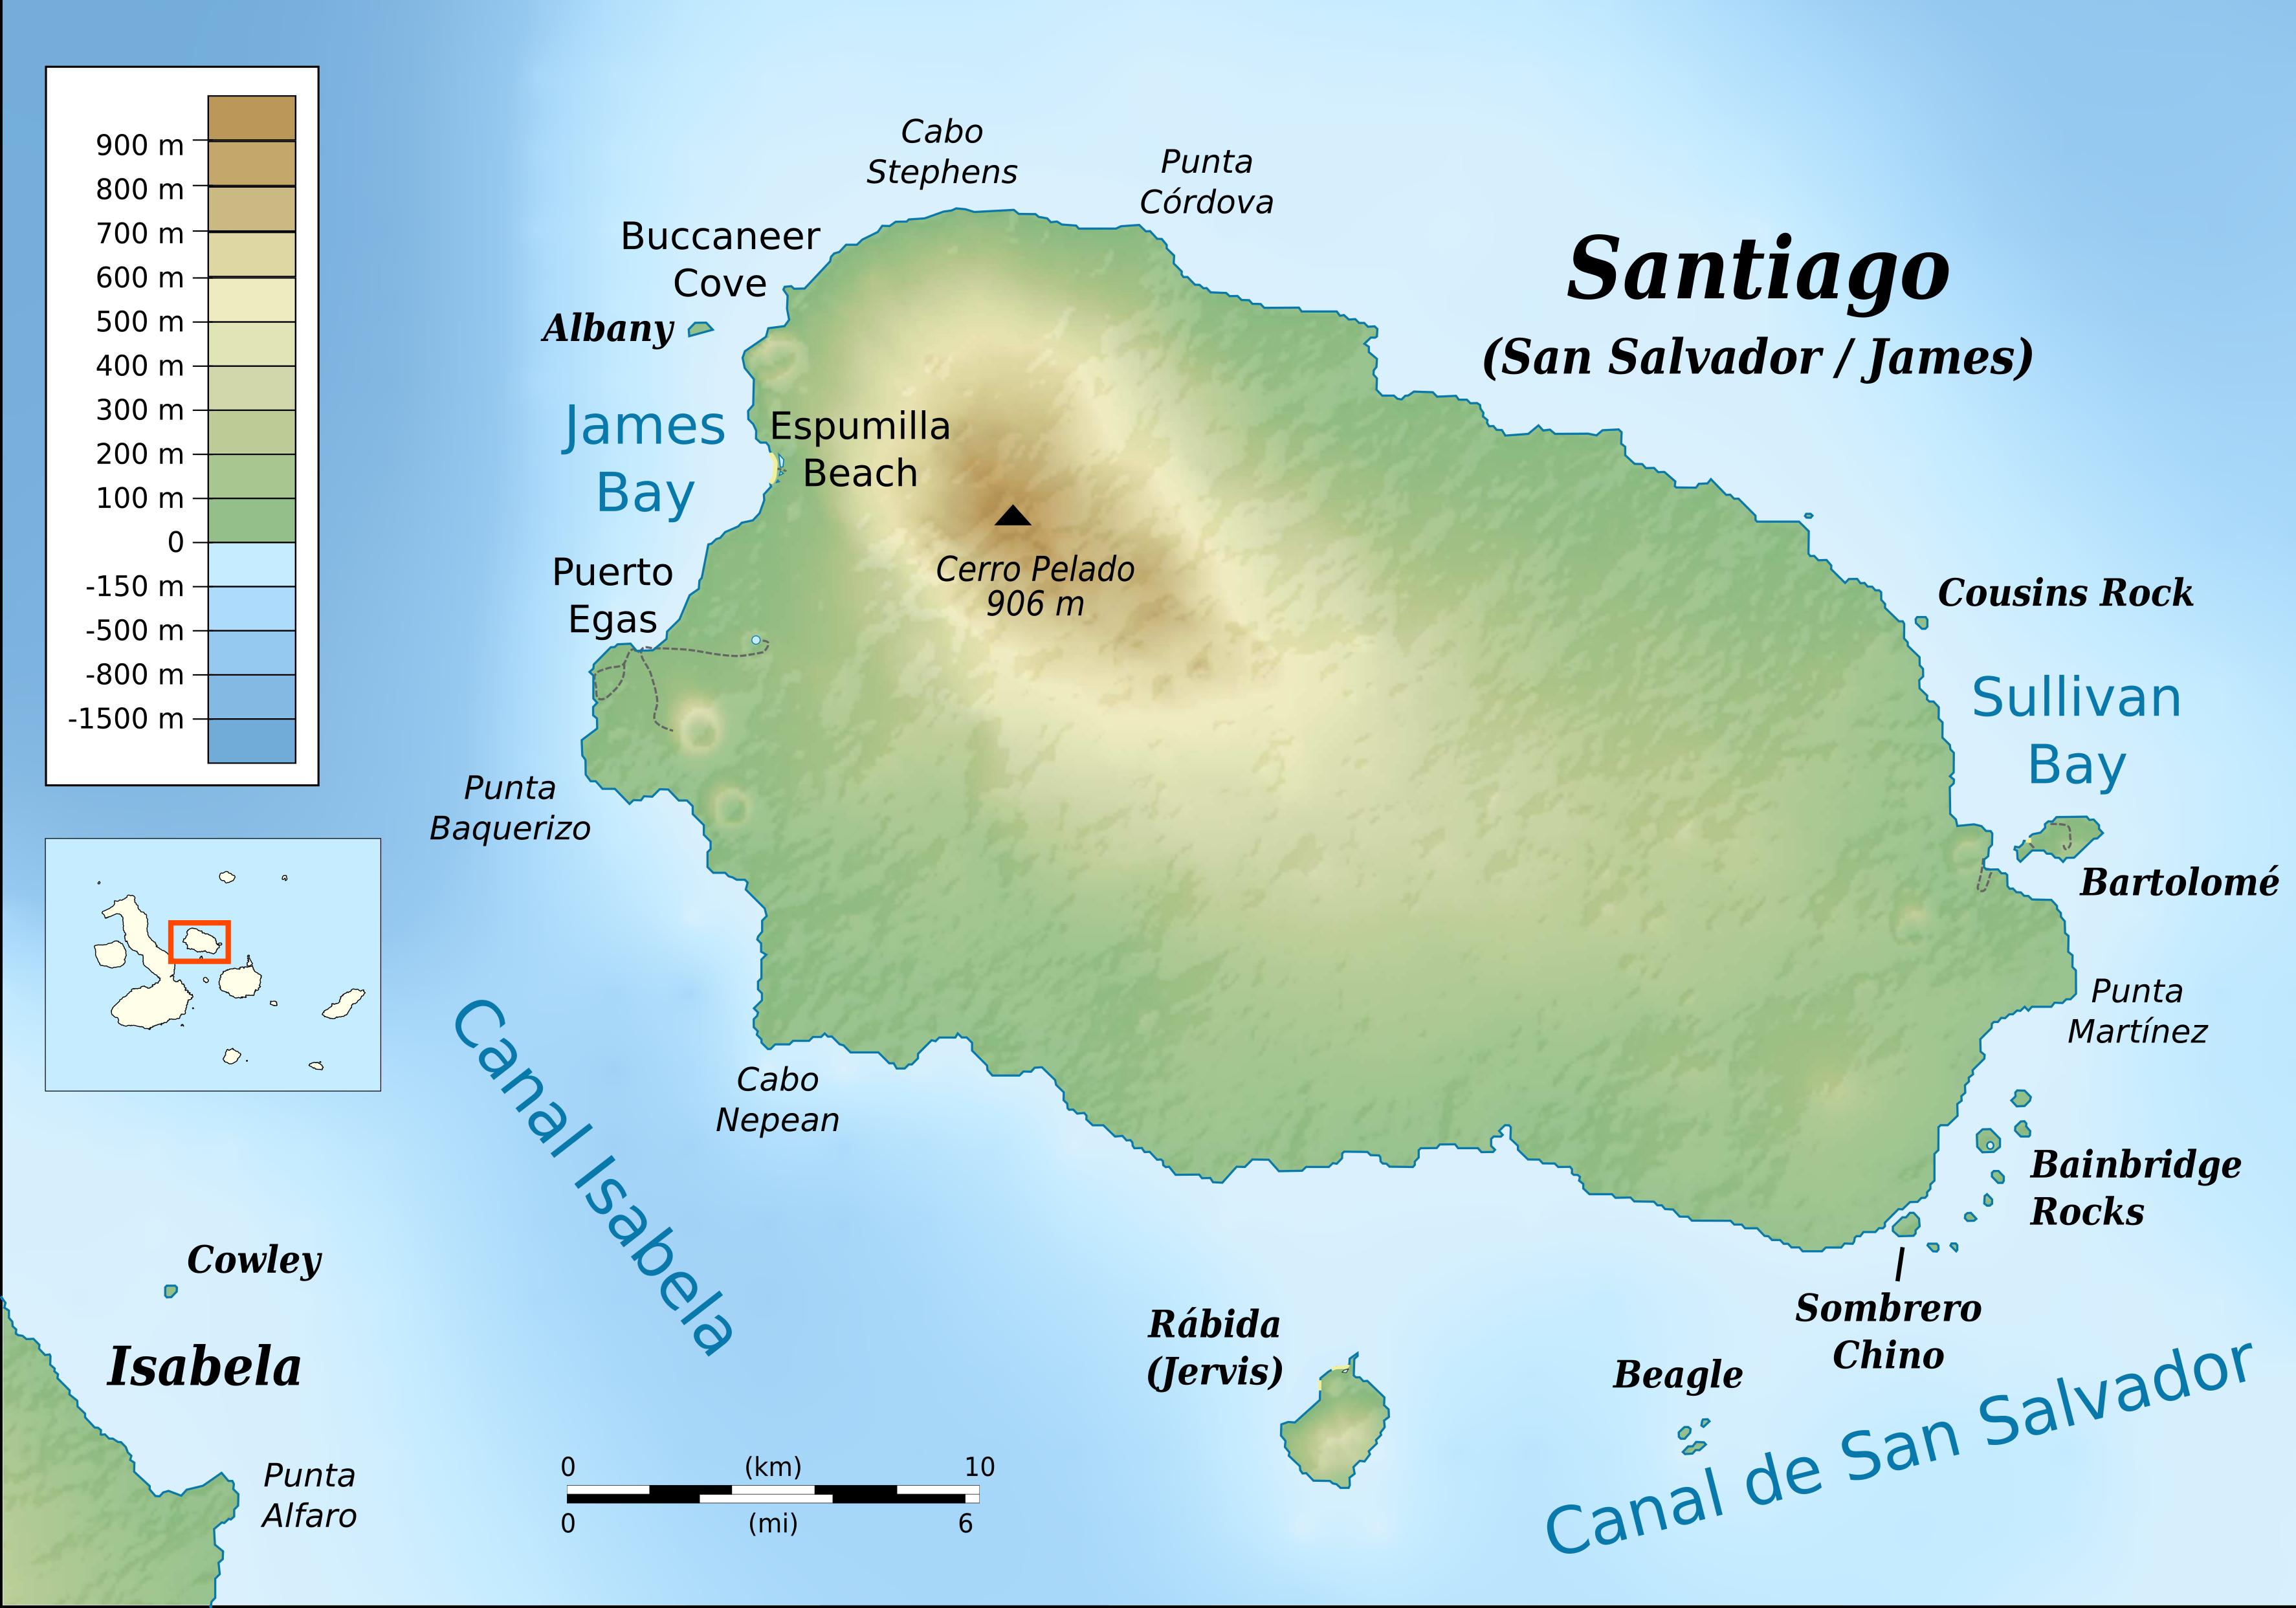 FileSantiago Galapagos Topographic Mapdepng Wikimedia Commons - Galapagos map